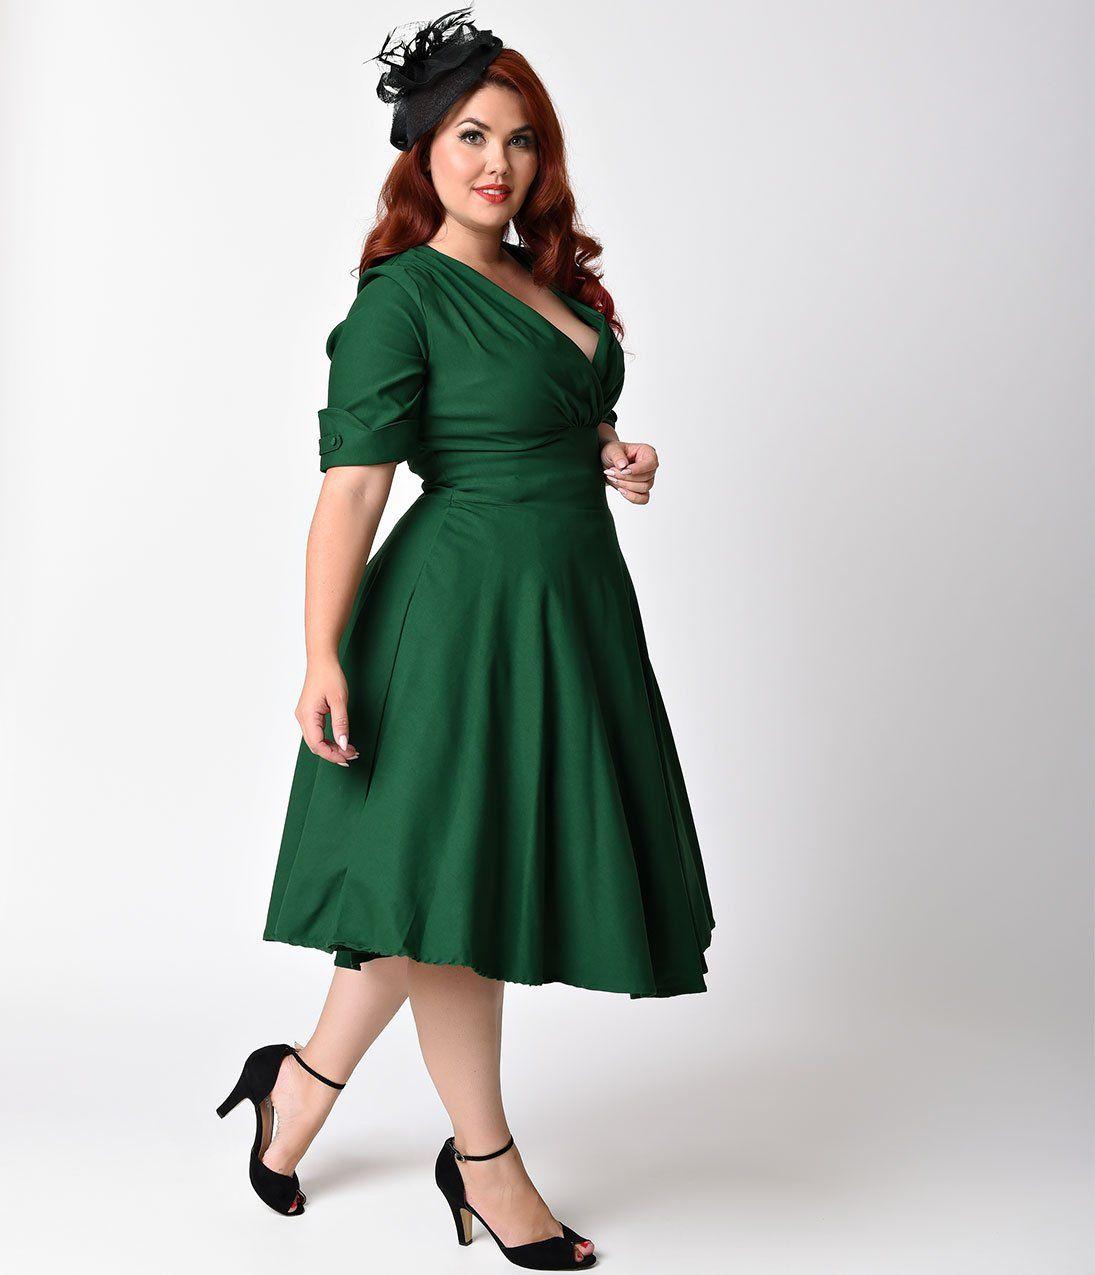 Unique Vintage Plus Size 1950s Emerald Green Delores Swing Dress With Sleeves Green Plus Size Dresses Bridesmaid Dresses Plus Size Knee Length Bridesmaid Dresses [ 1275 x 1095 Pixel ]